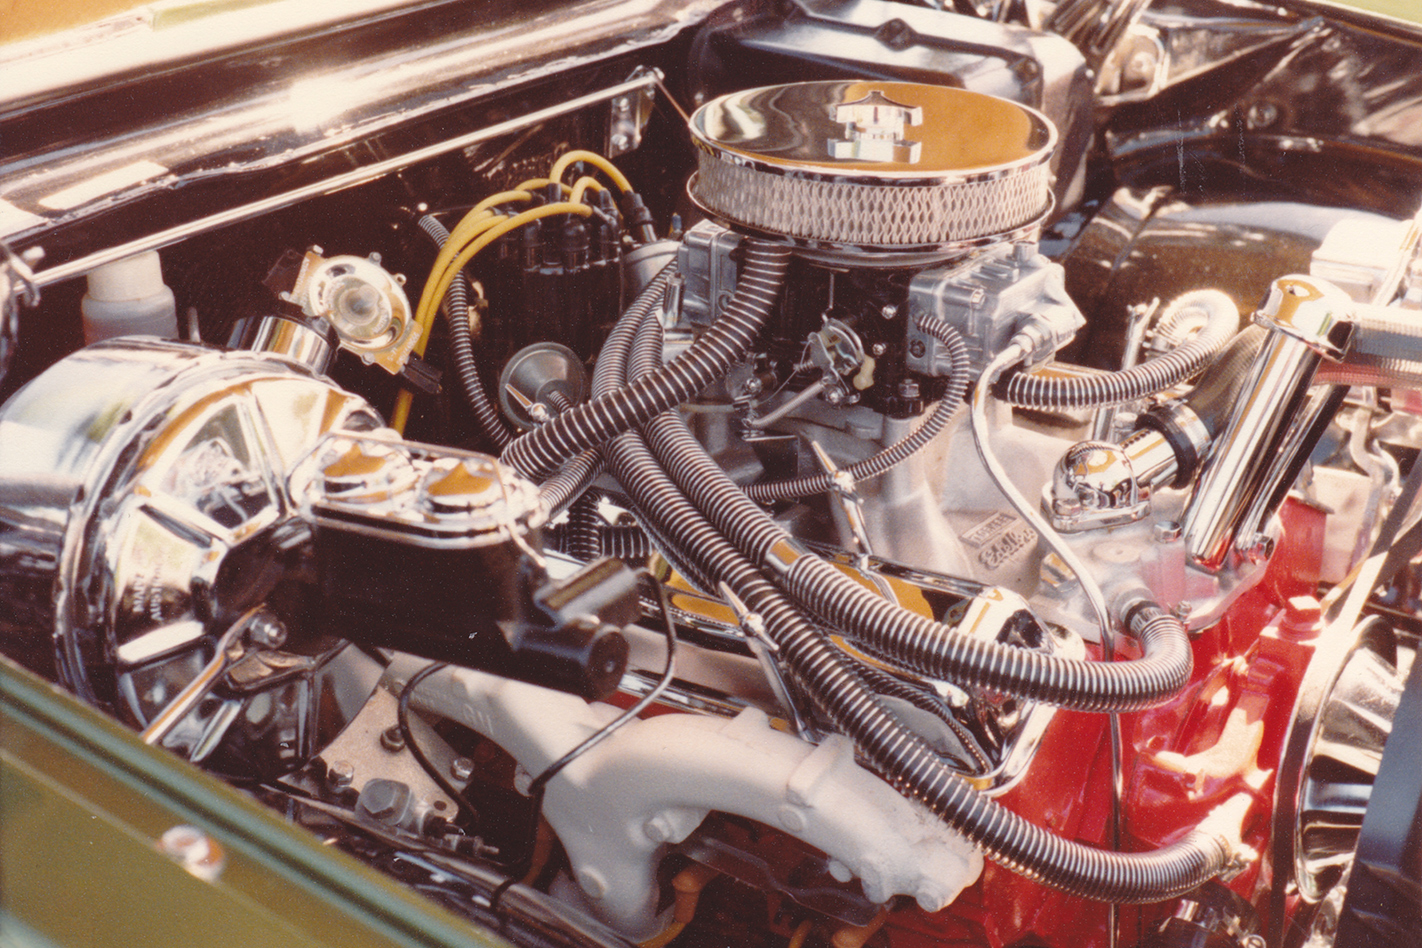 Green -Knight -HG-Panelvan -engine